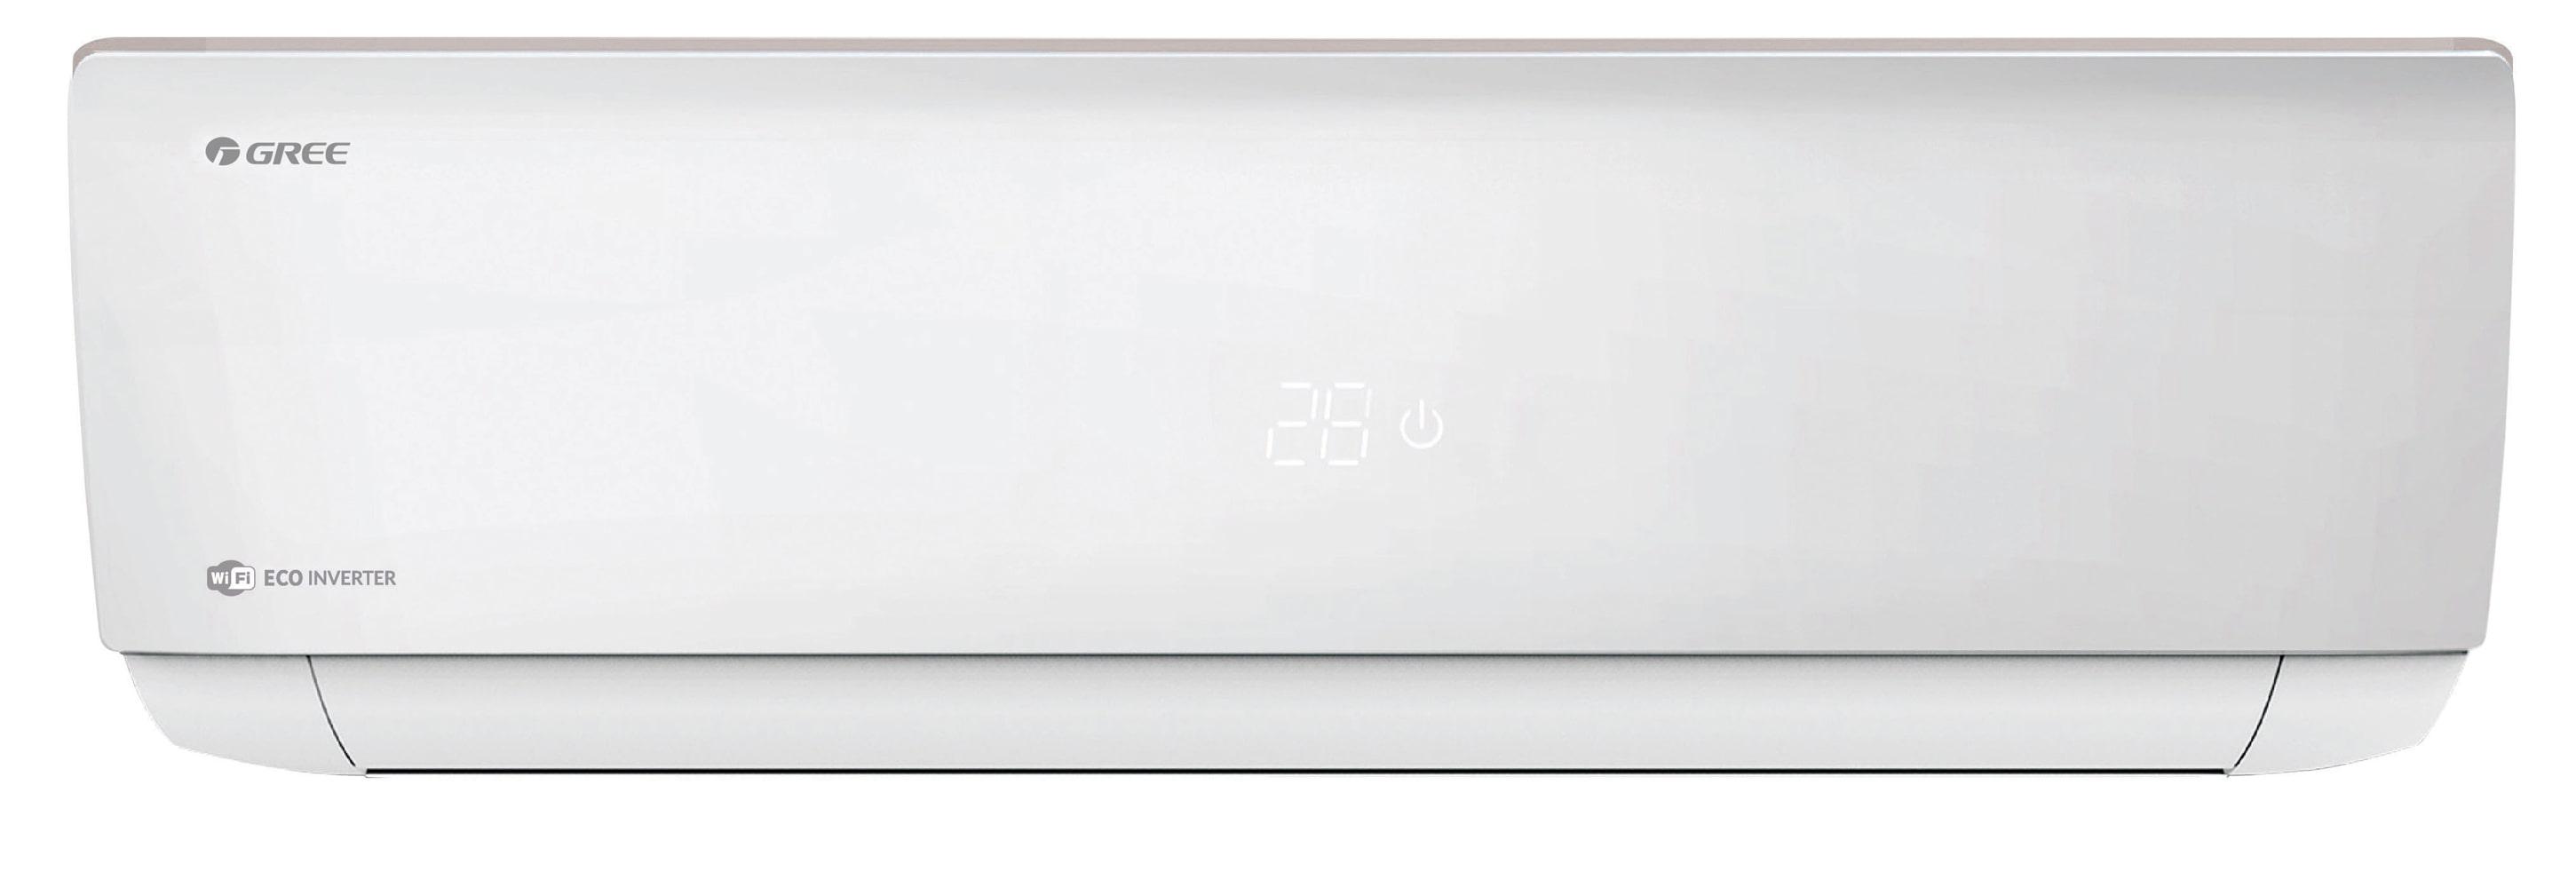 Pachet: aer conditionat cu montaj inclus Gree Bora A4 SIlver 12000 BTU GWH12AAB-K6DNA4A Inverter, A++, kit instalare inclus, Control WiFi, Filtru Silver Ion si Cold Plasma, I Feel, Afisaj Ceas